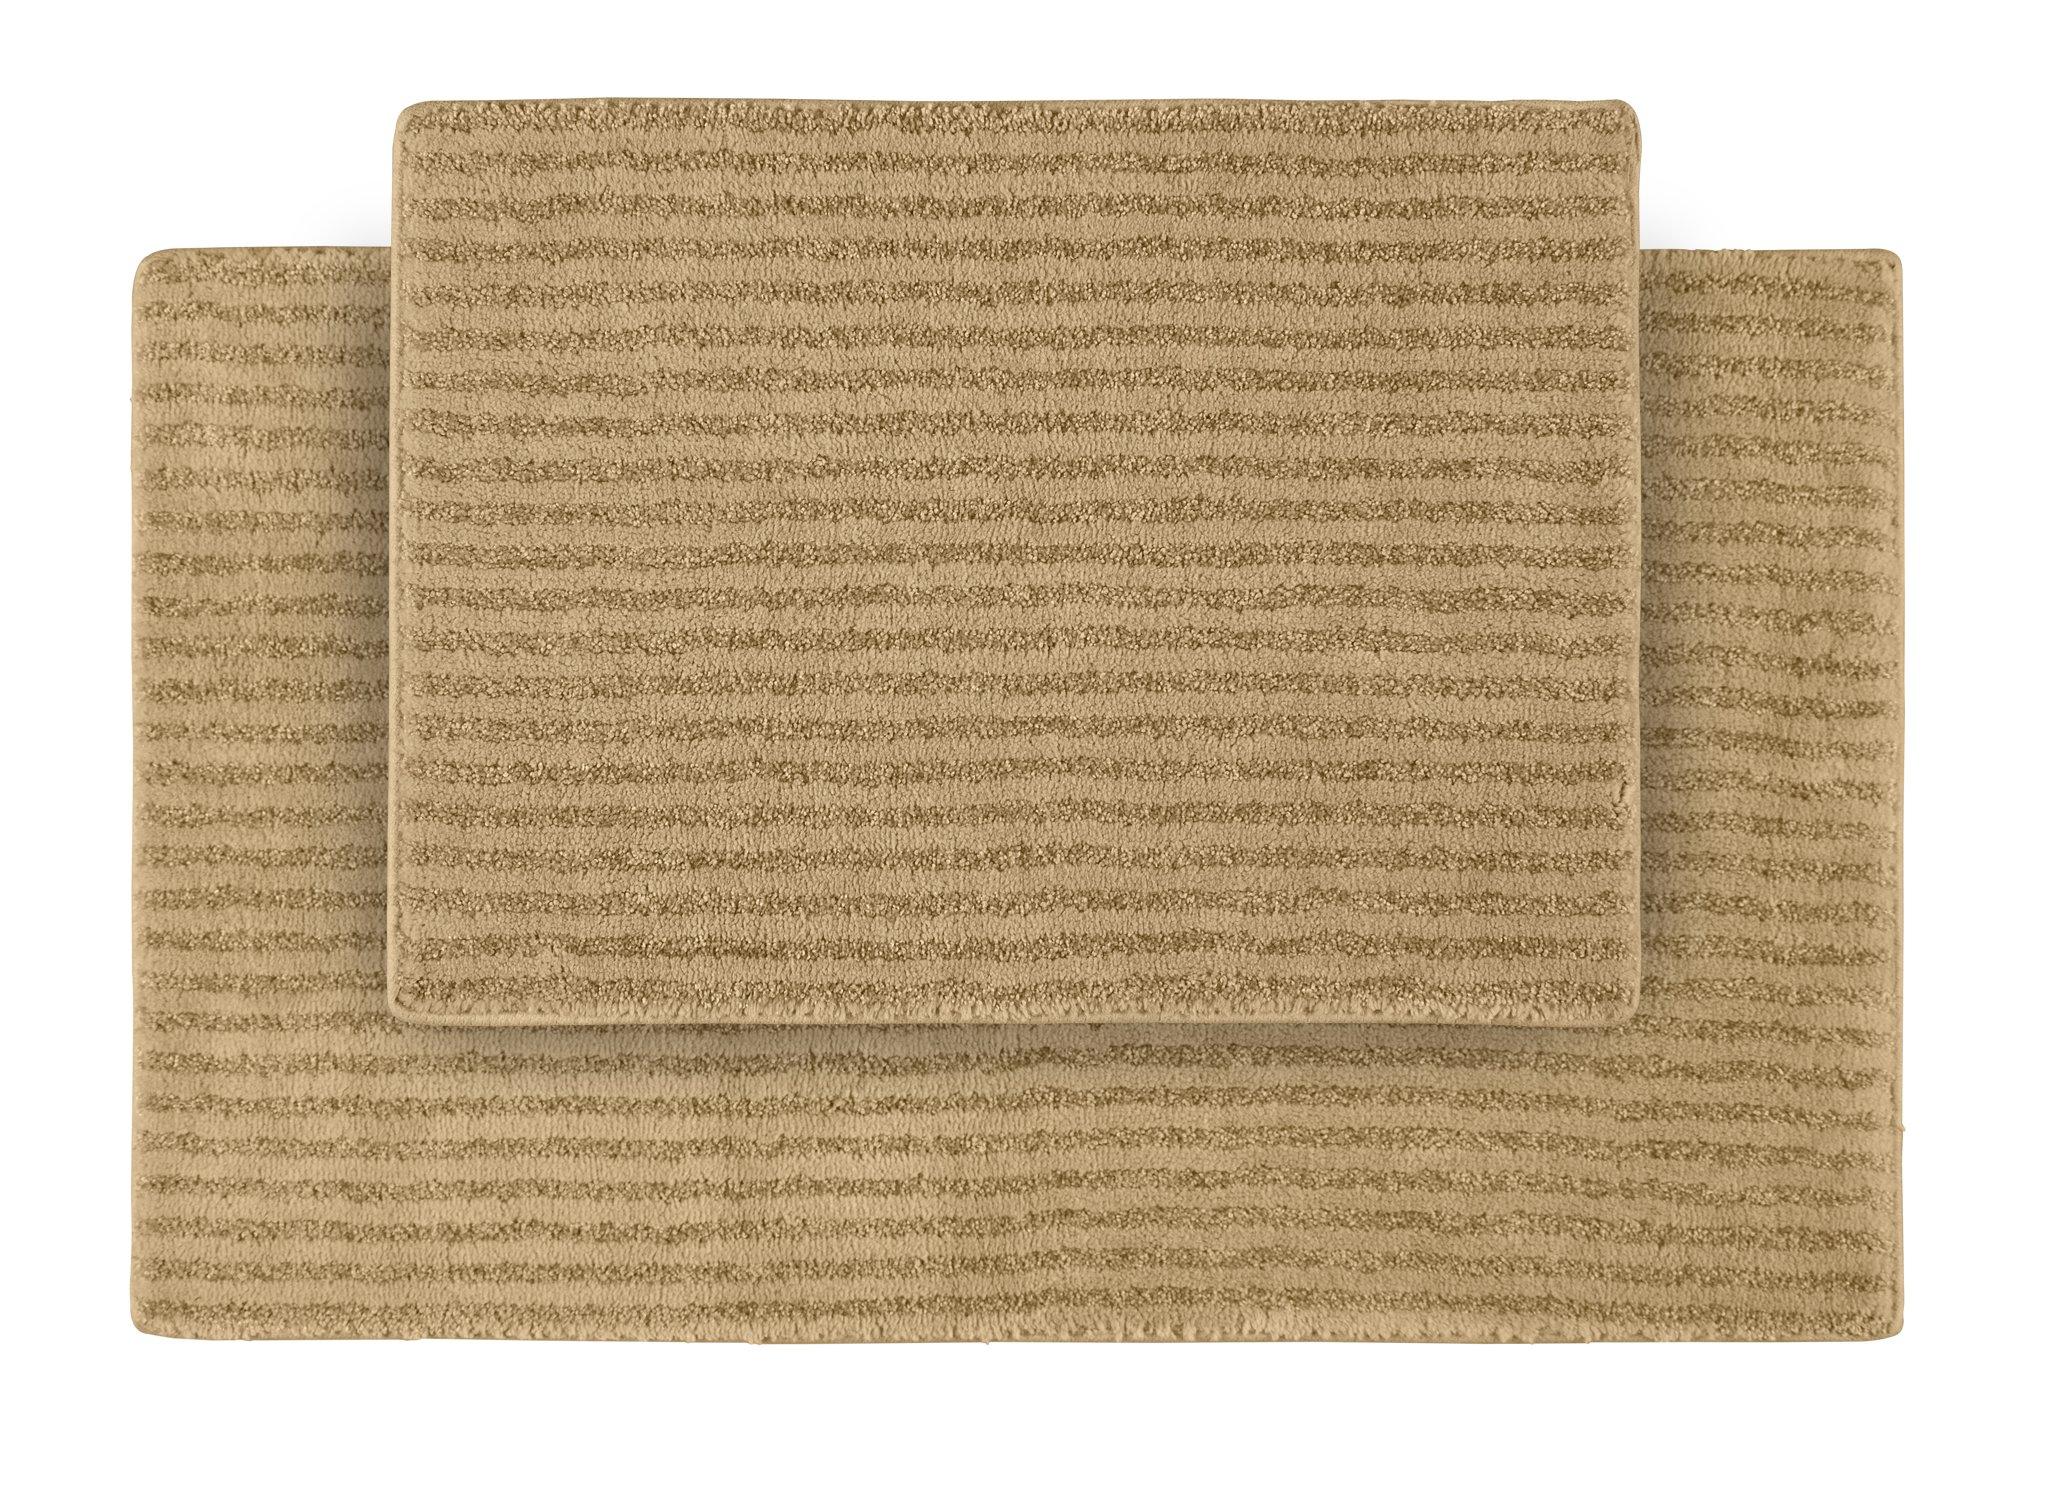 Garland Rug 2-Piece Sheridan Nylon Washable Bathroom Rug Set, Linen